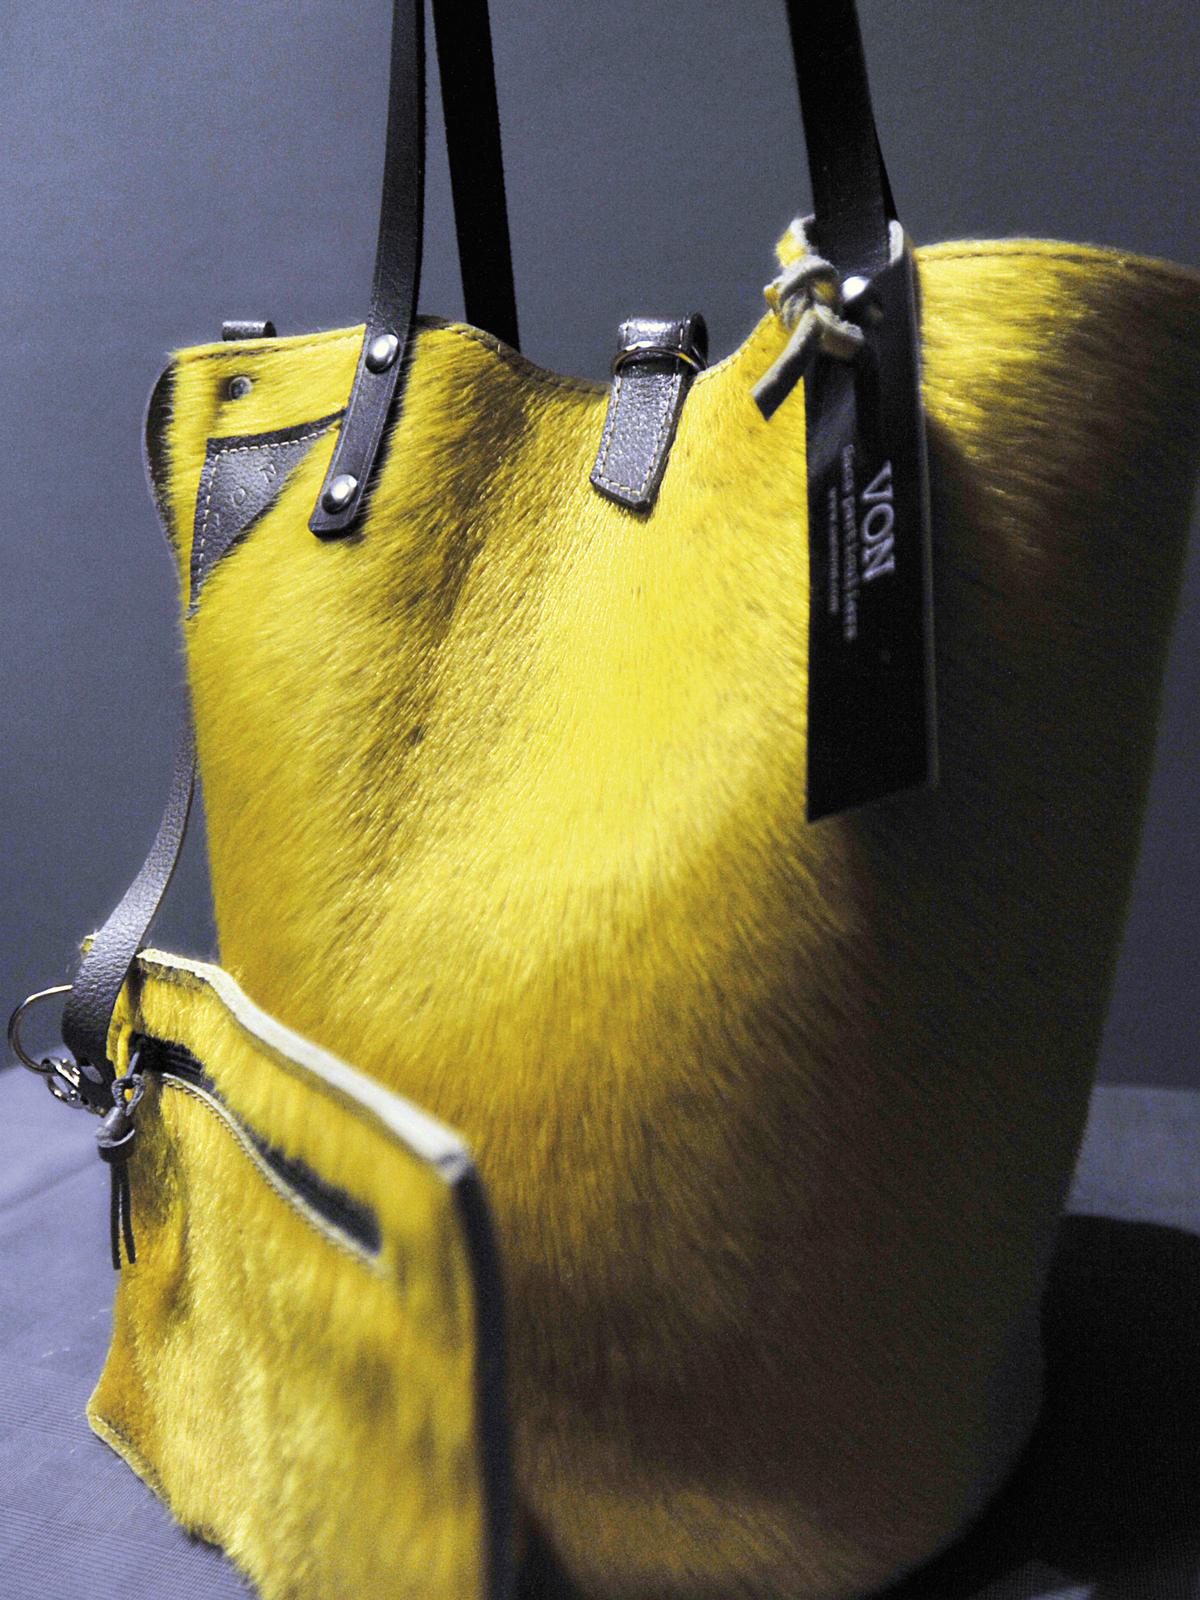 vitrine-cadeaux-noel-sacs-von-jaune-fourrure